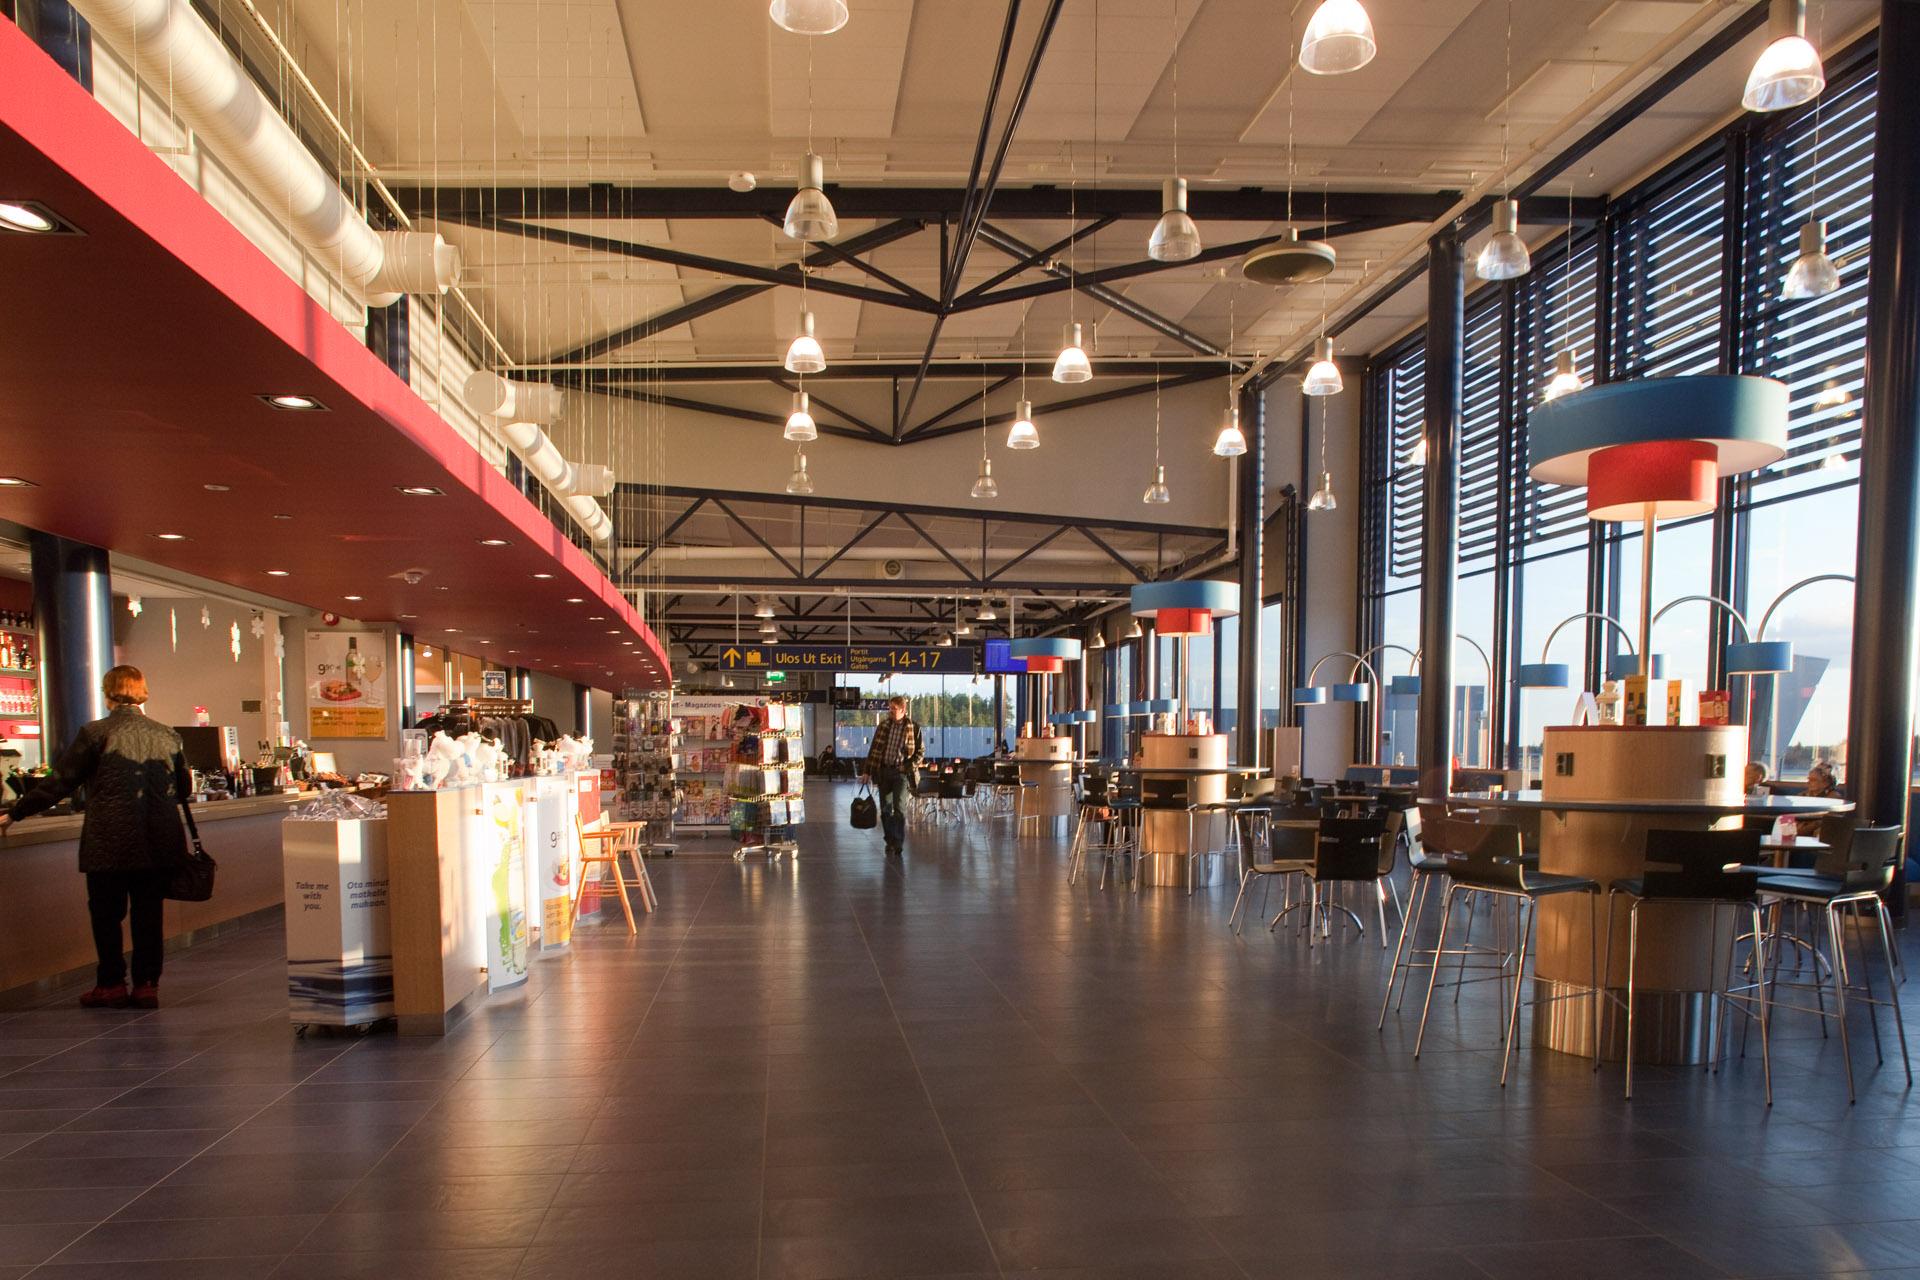 Pysäköinti Oulun Lentoasema